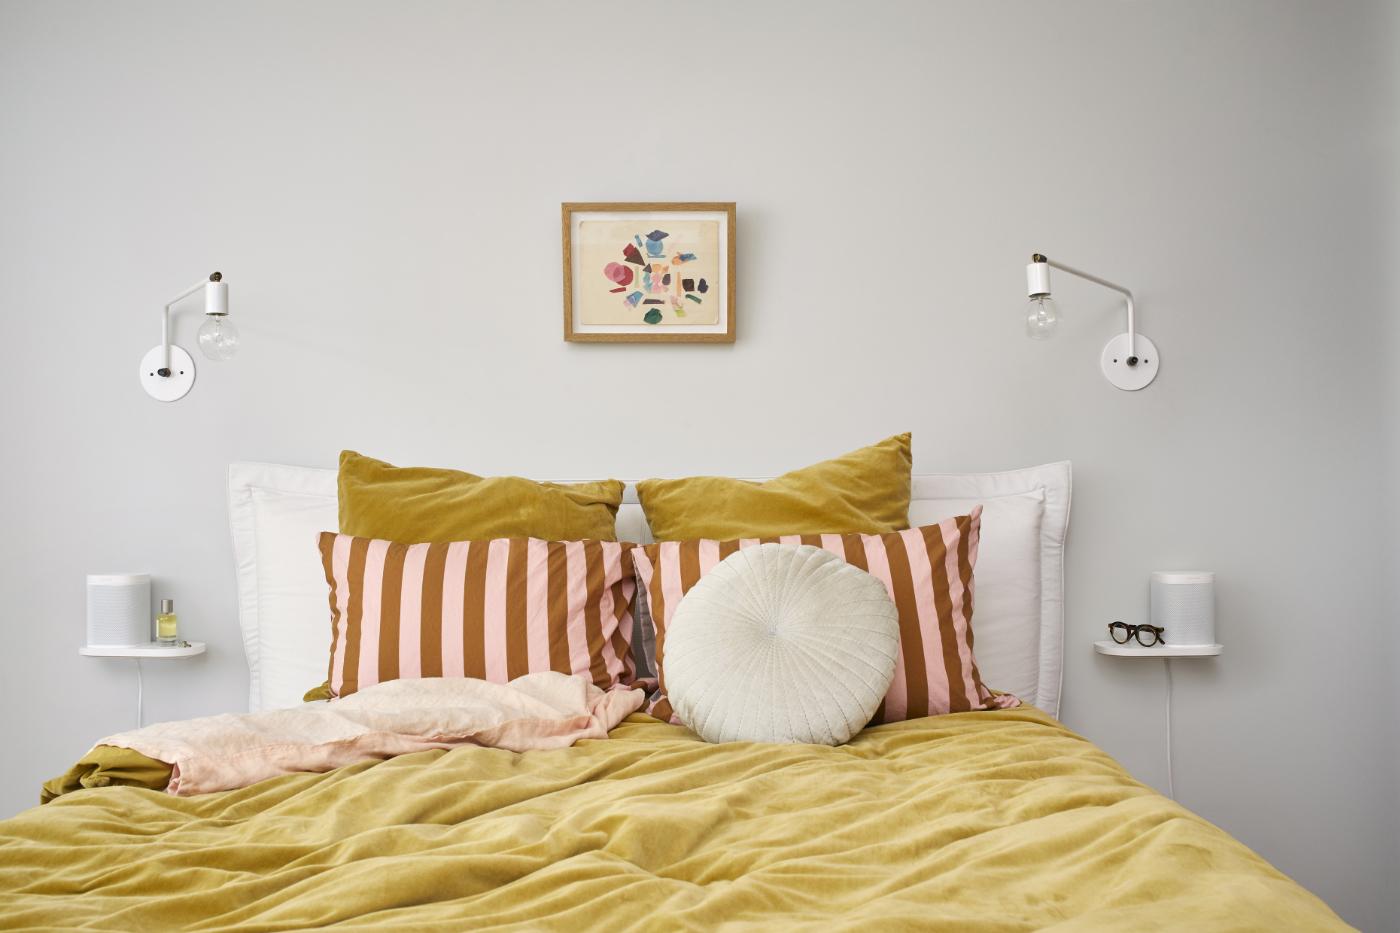 Sonos_Accessories_Shelf-White-Lifestyle_Shot-Bedroom-Q1FY19_Core_Creative_MST-MST_JPEG_fid23718